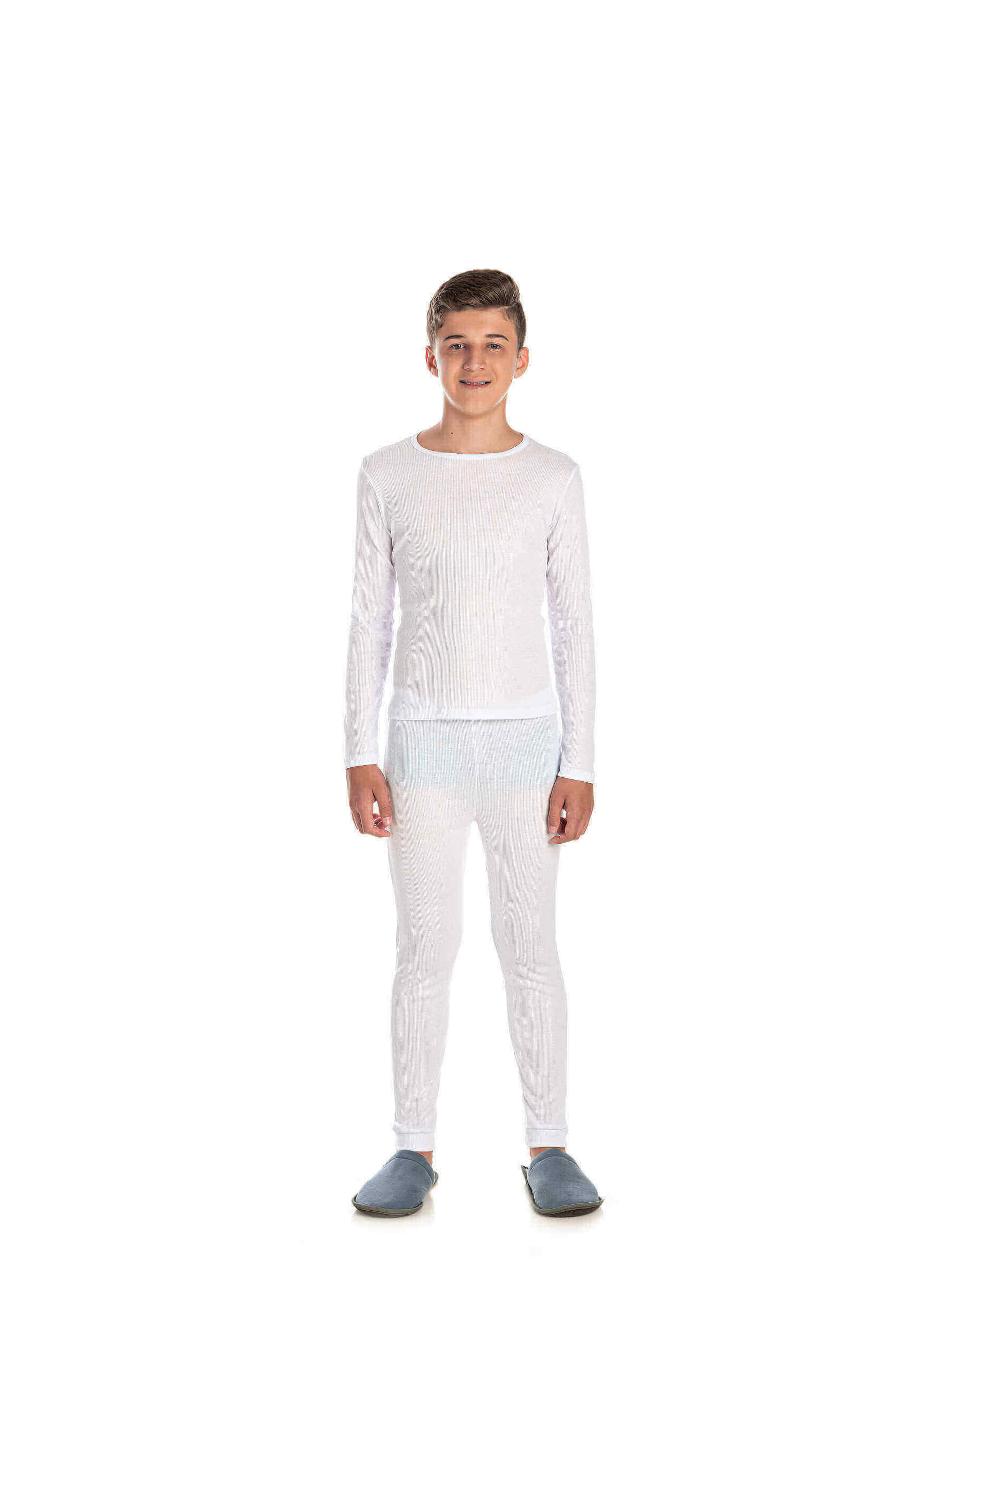 204/B - Calça Infanto Juvenil Unissex Underwear